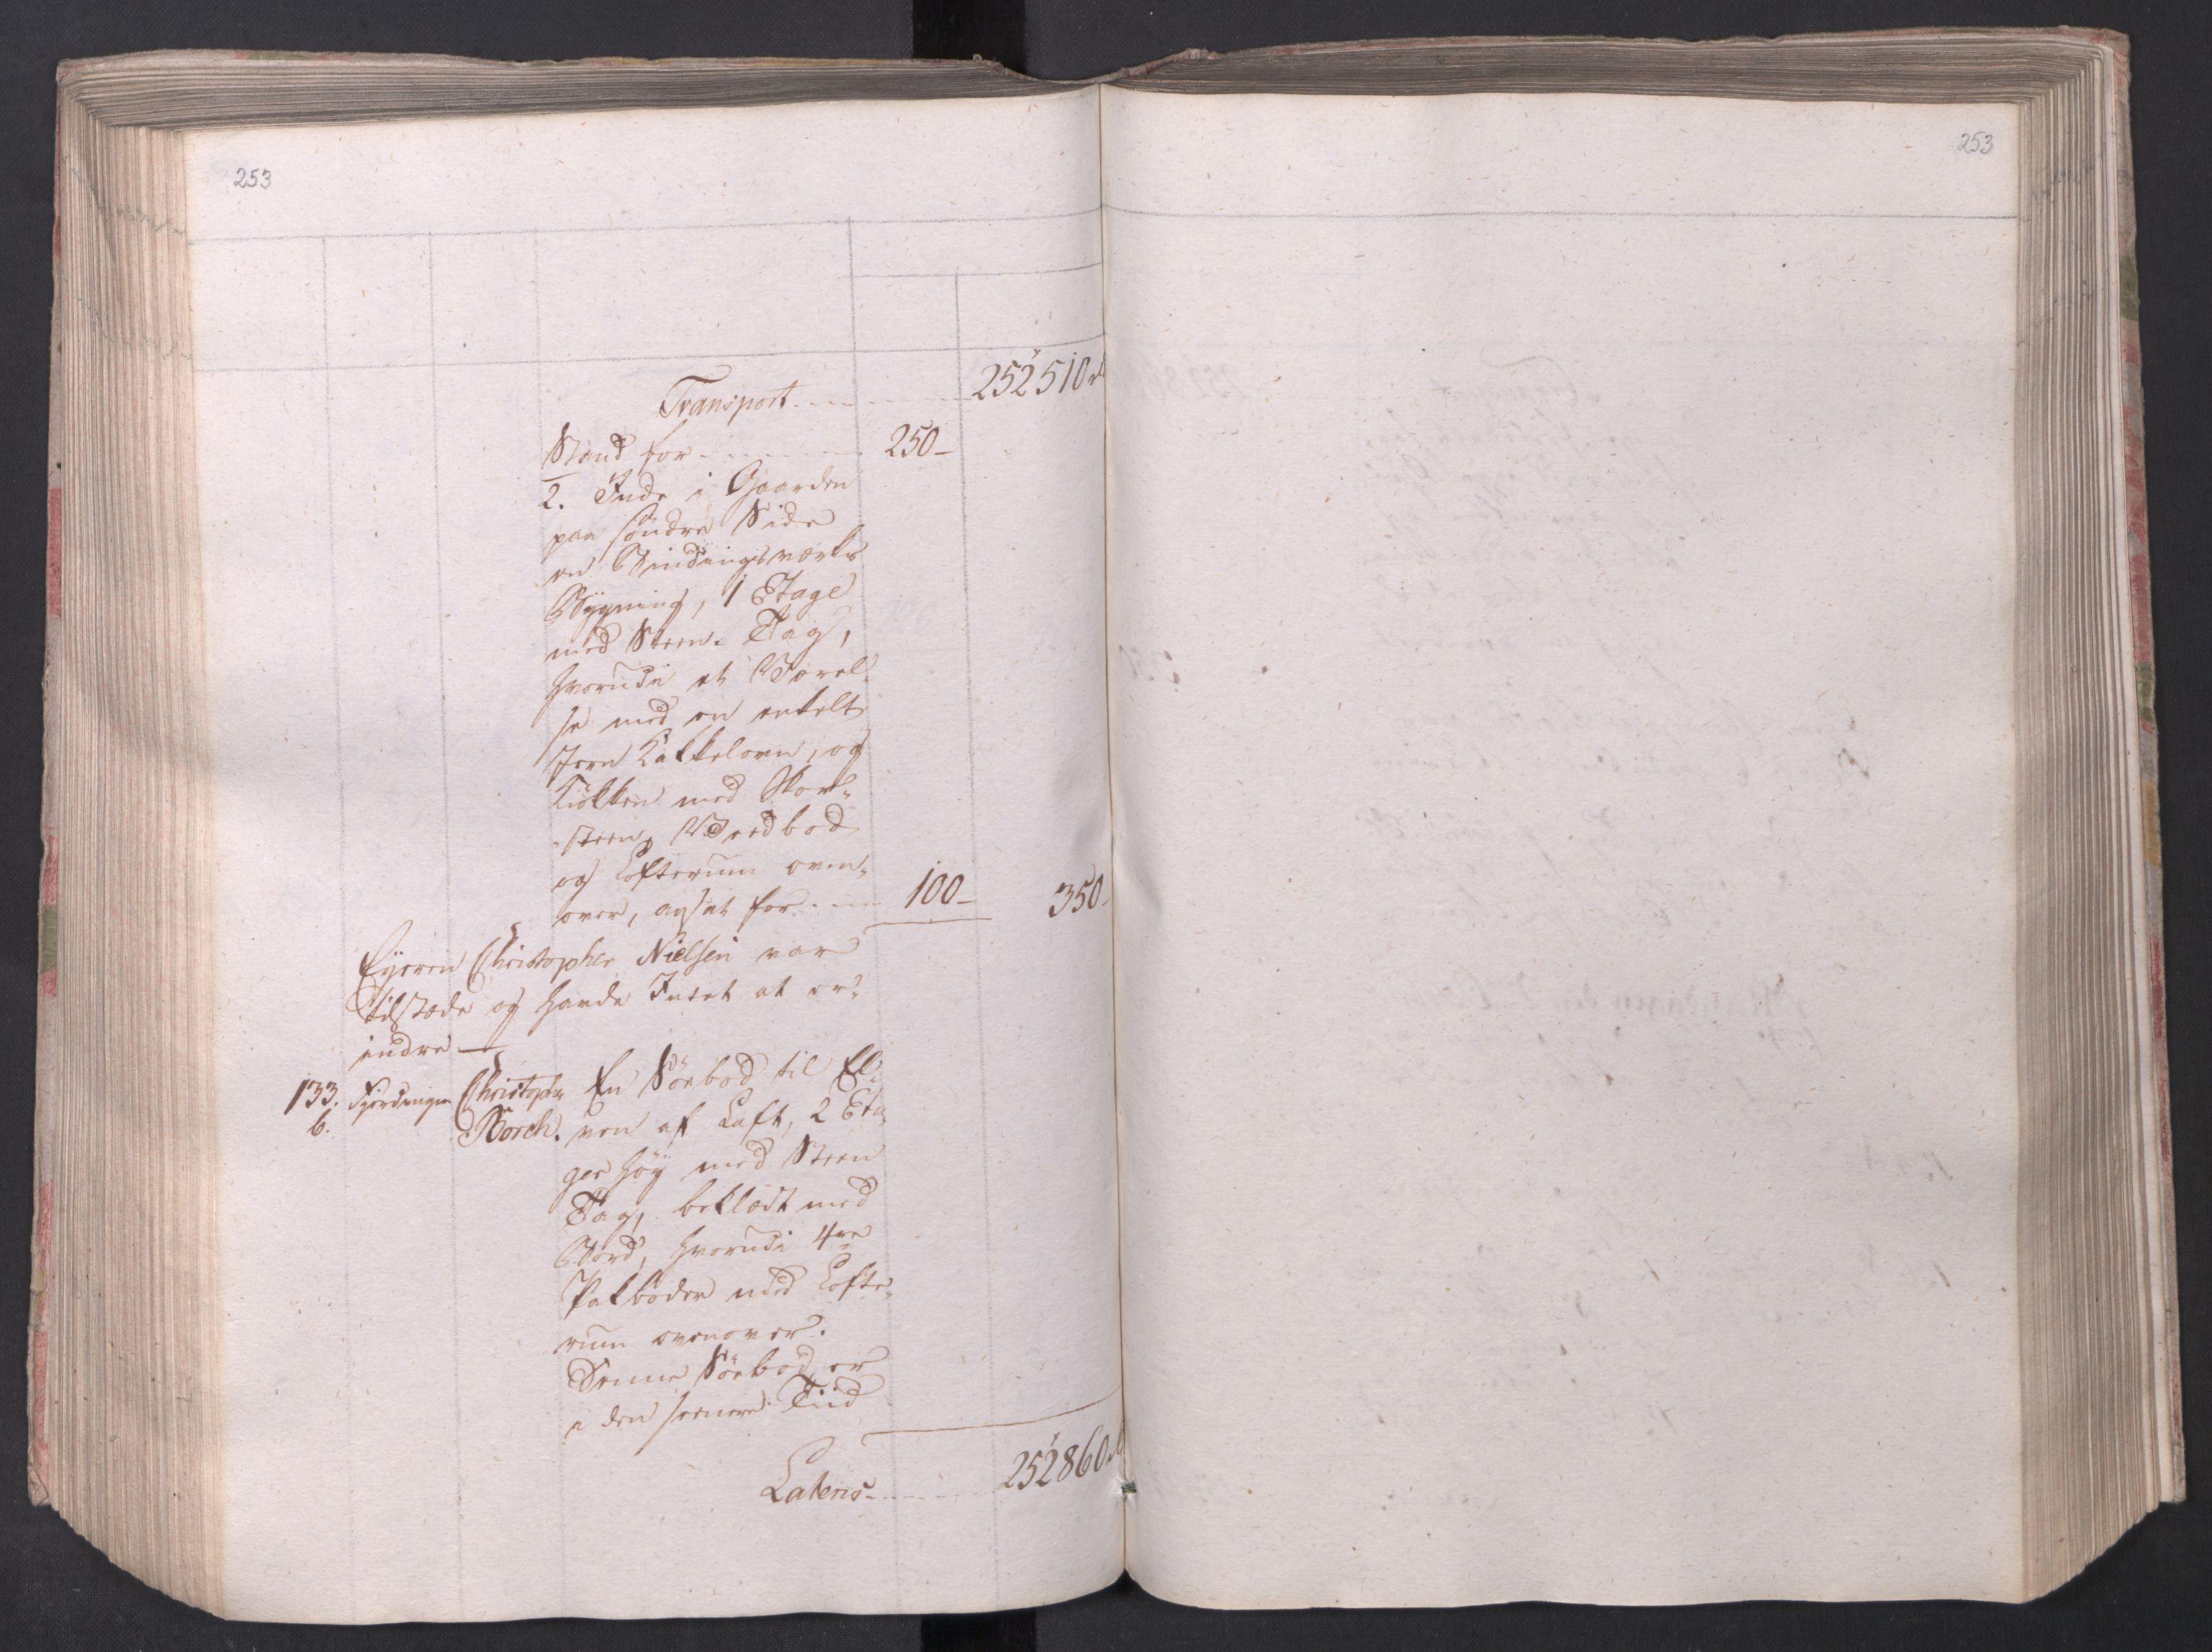 SAO, Kristiania stiftamt, I/Ia/L0015: Branntakster, 1797, s. 253